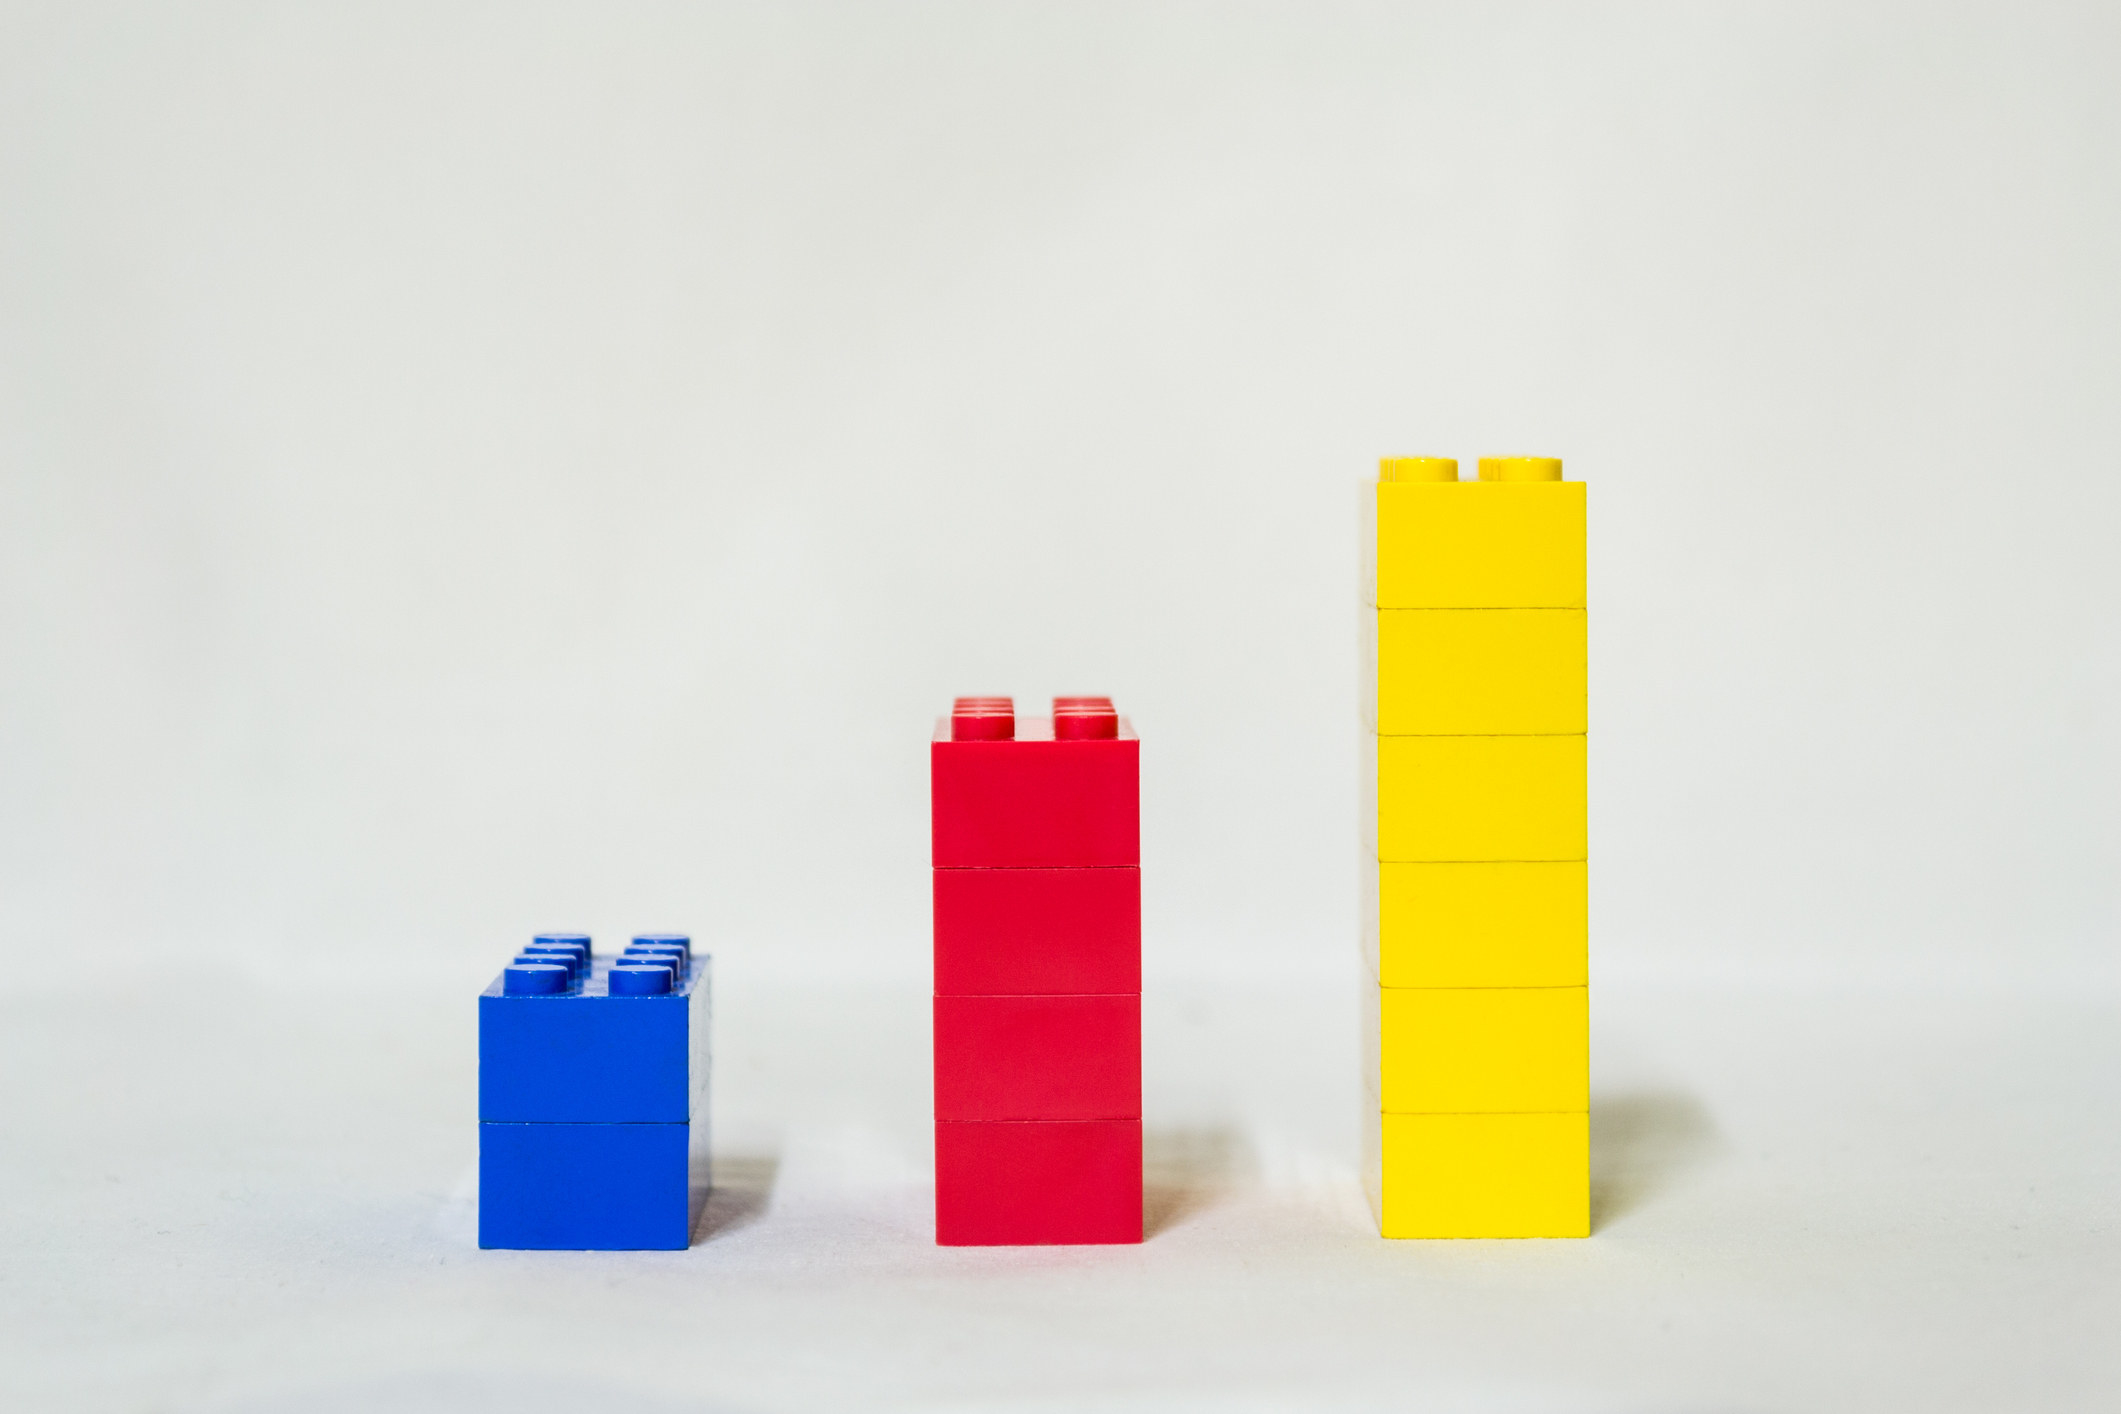 Three stacks of Lego blocks